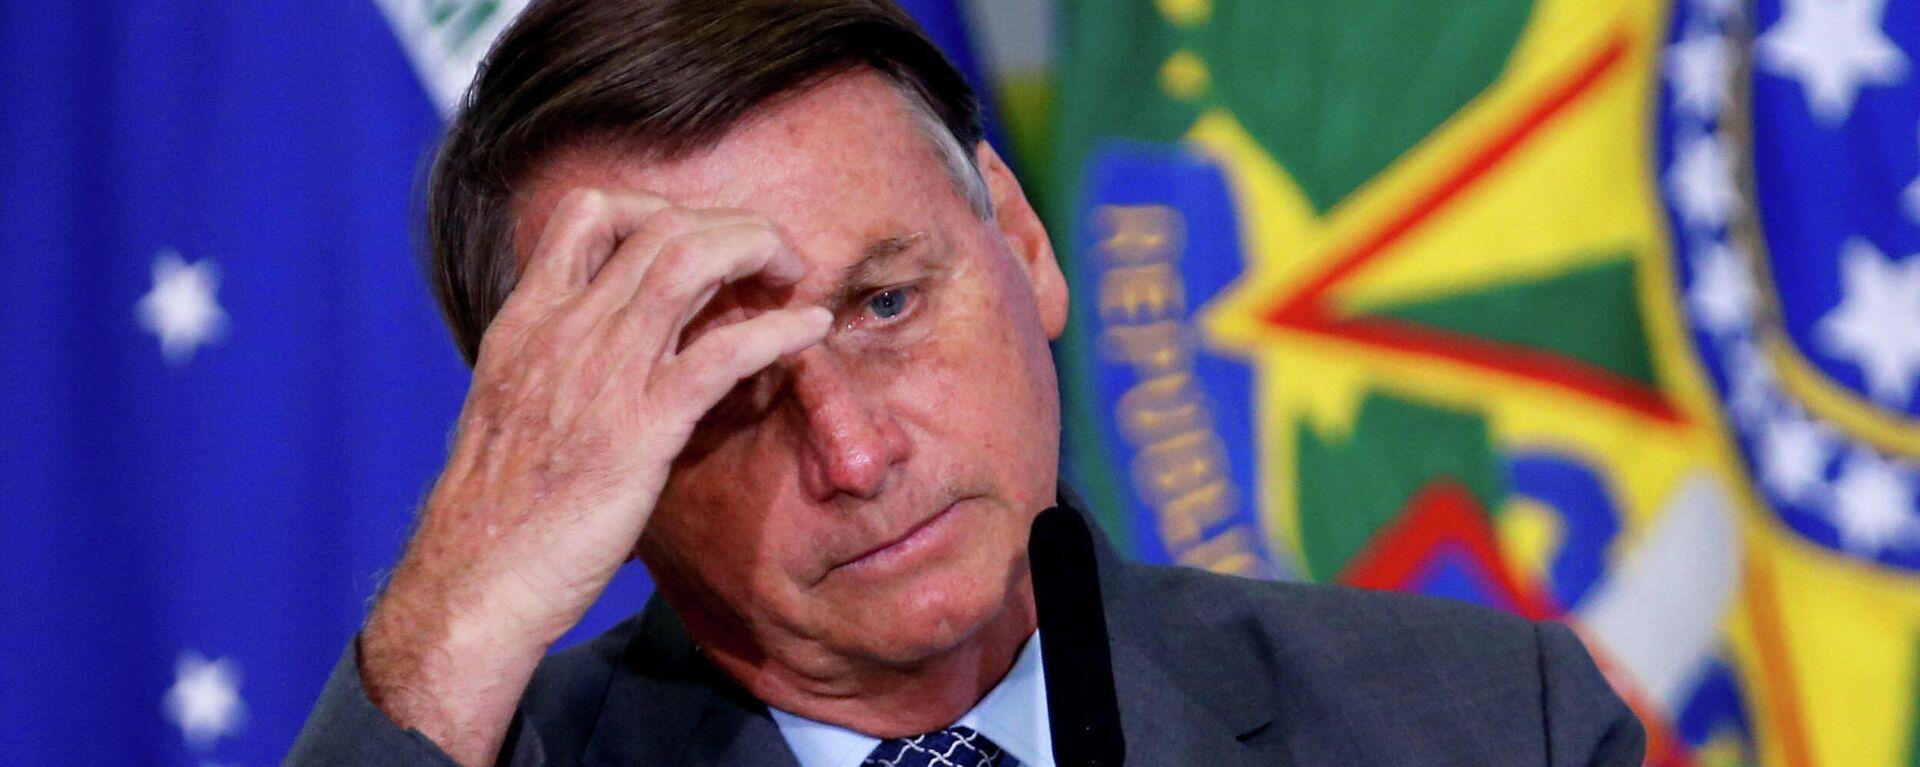 Jair Bolsonaro, presidente de Brasil - Sputnik Mundo, 1920, 27.05.2021